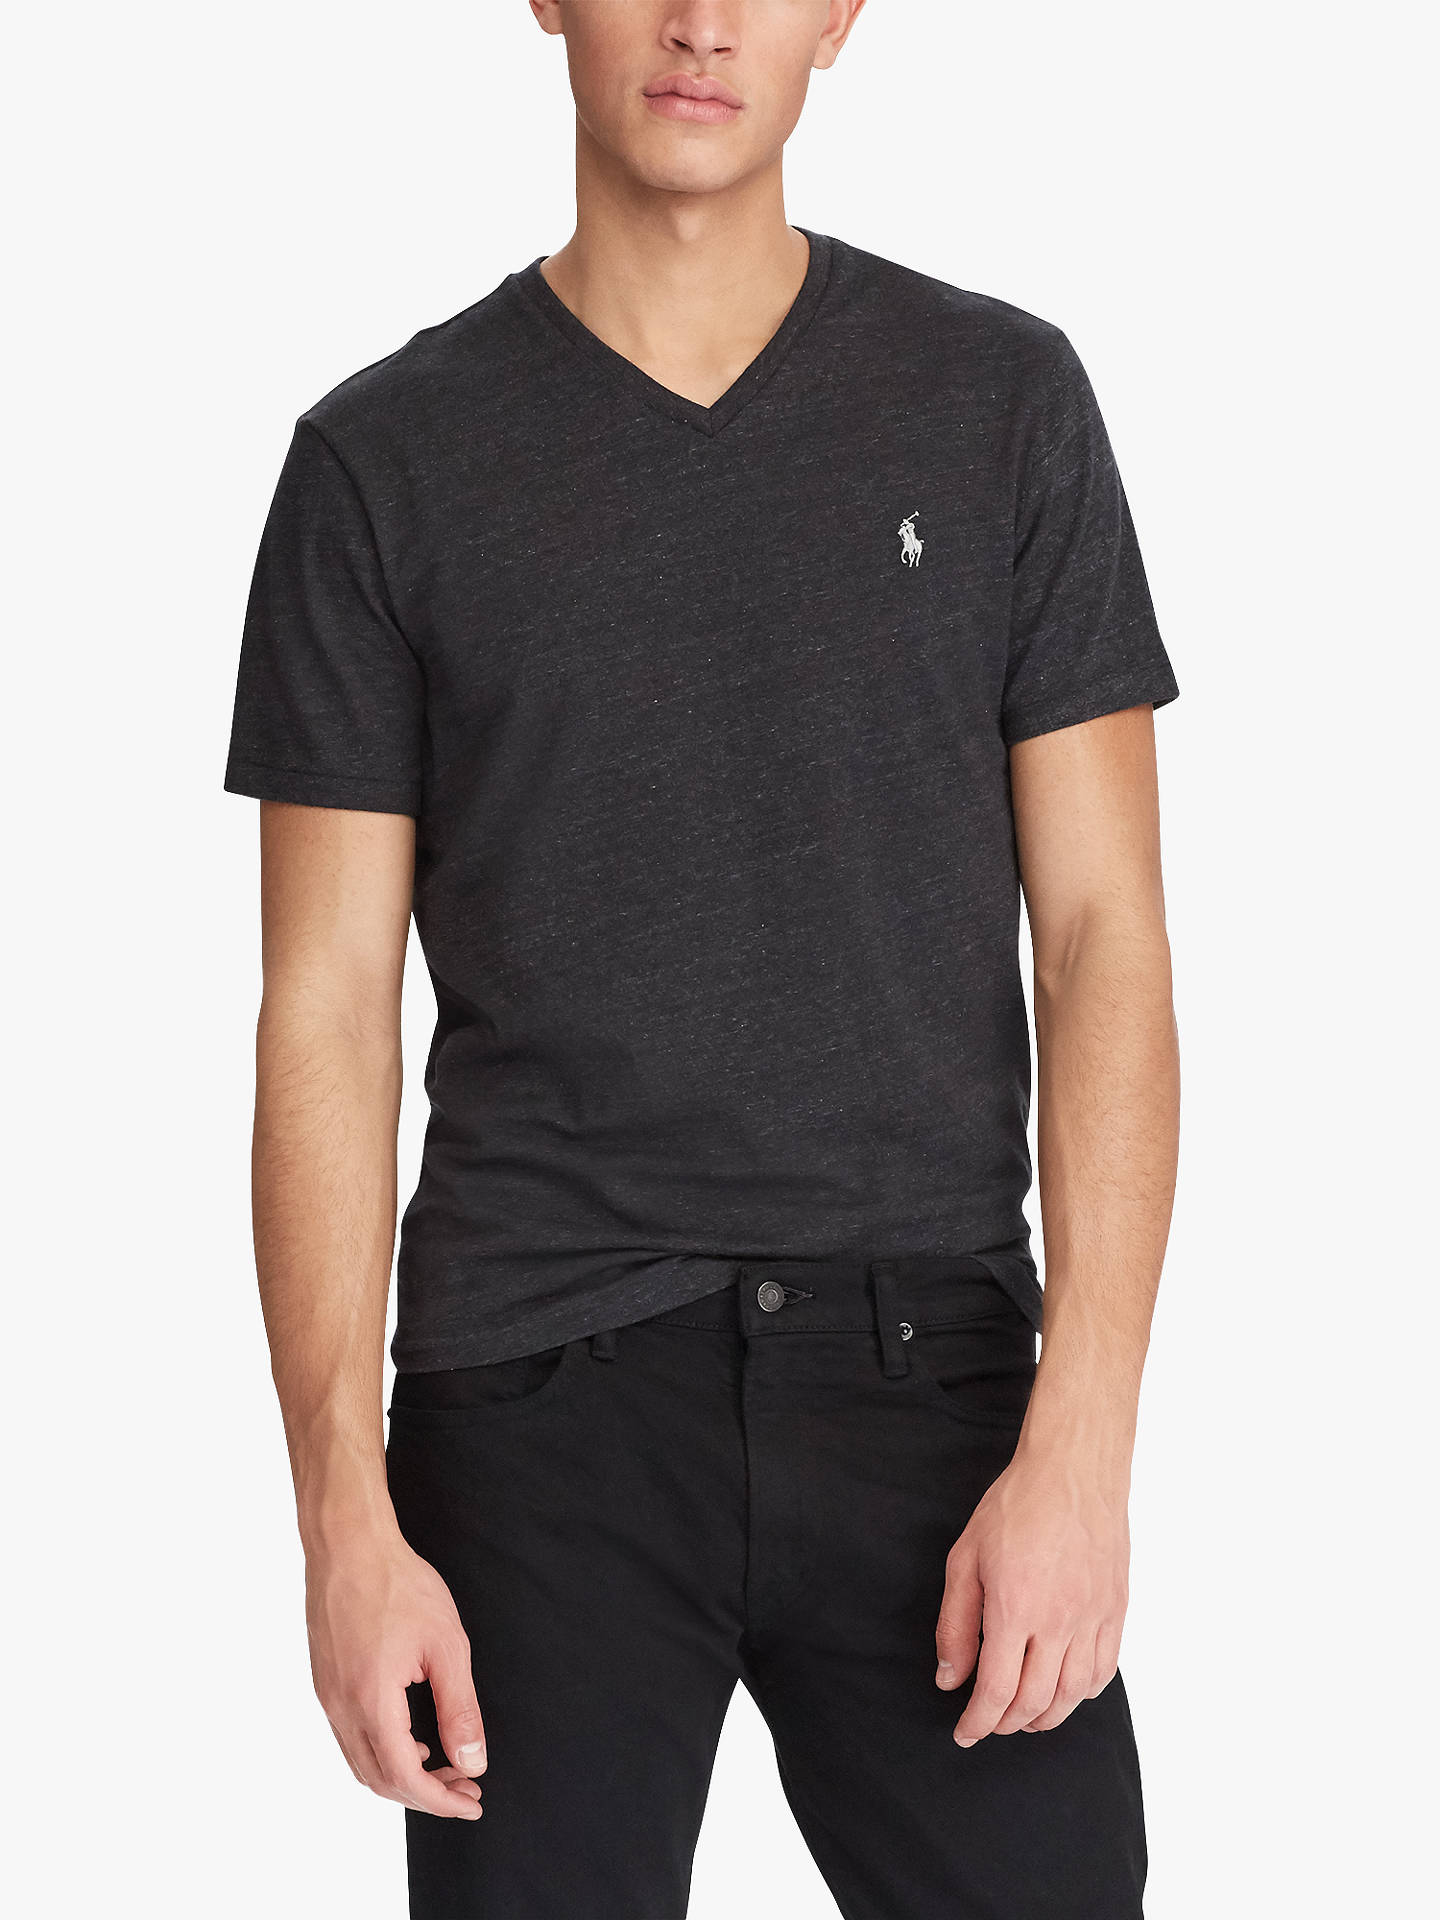 f84128a1 Polo Ralph Lauren V-Neck T-Shirt, Black Marl Heather at John Lewis ...